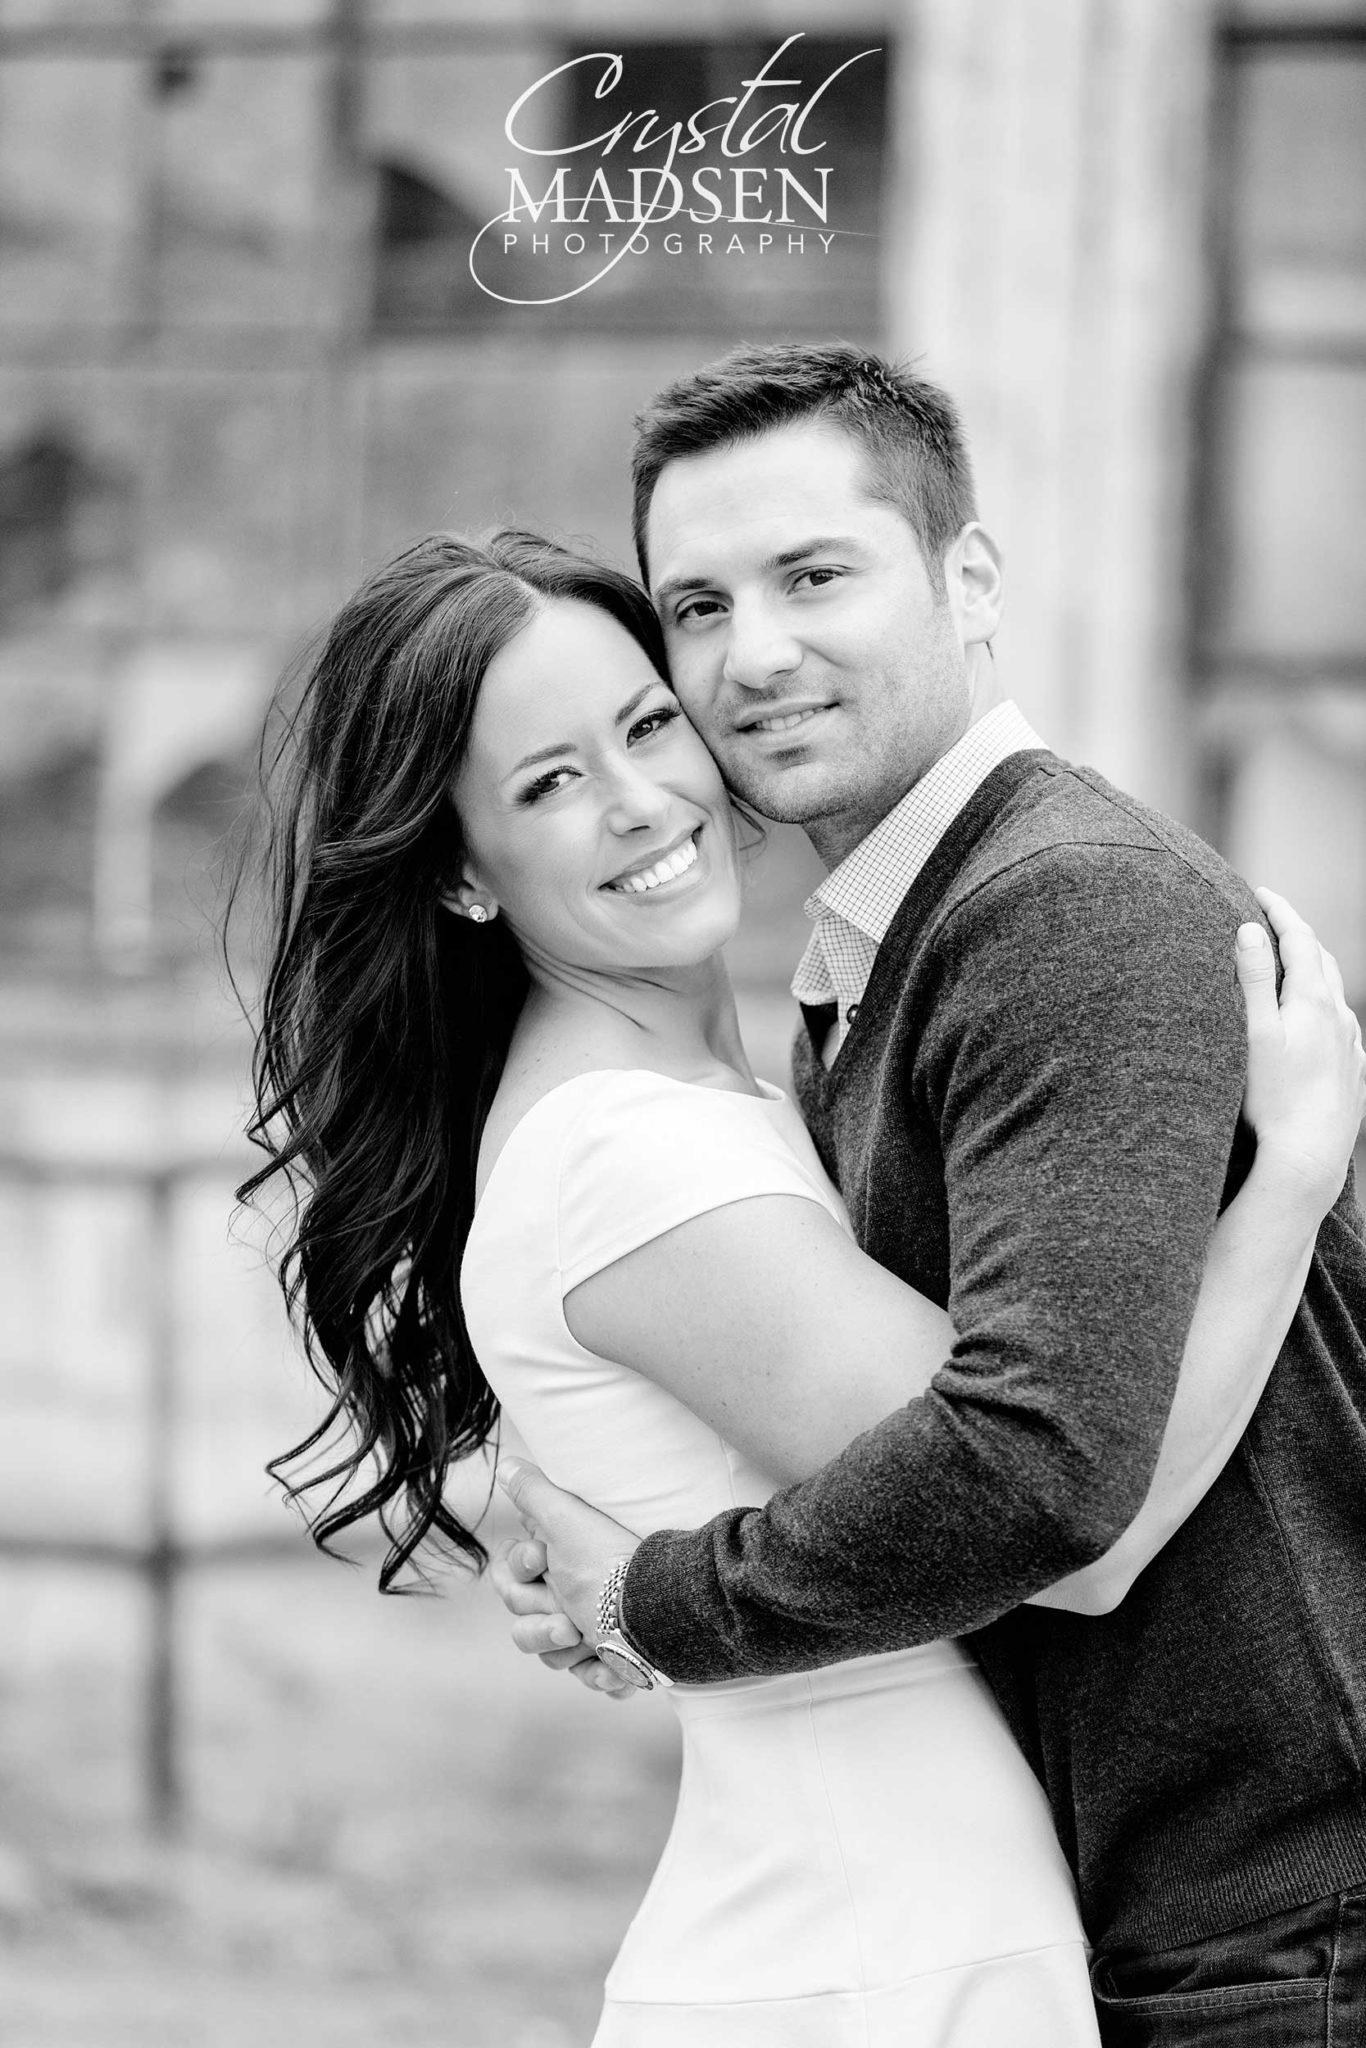 Engagement Photos in Spokane